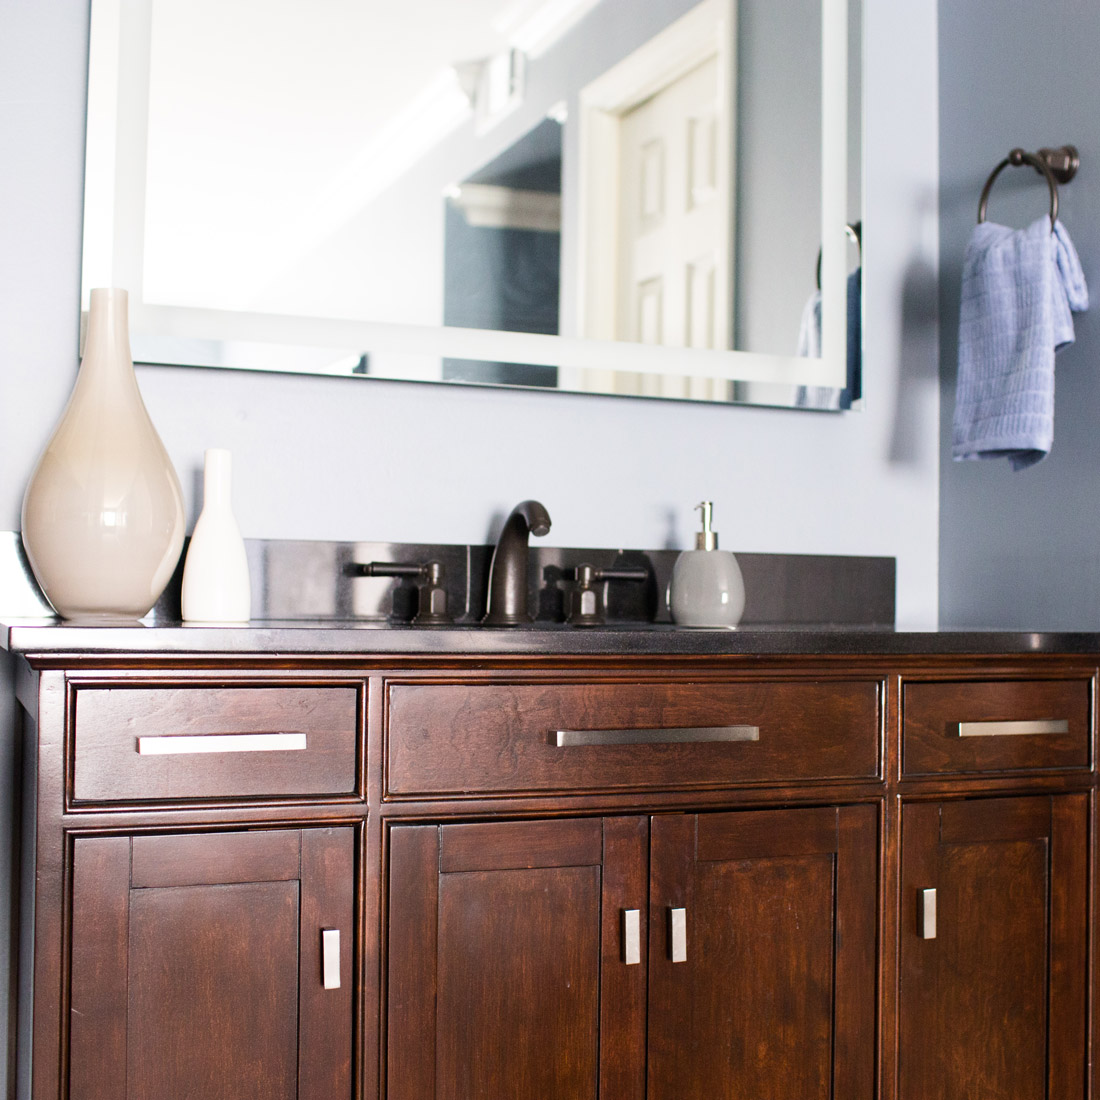 master bathroom vanity and backlit mirror design by sara bates interior design